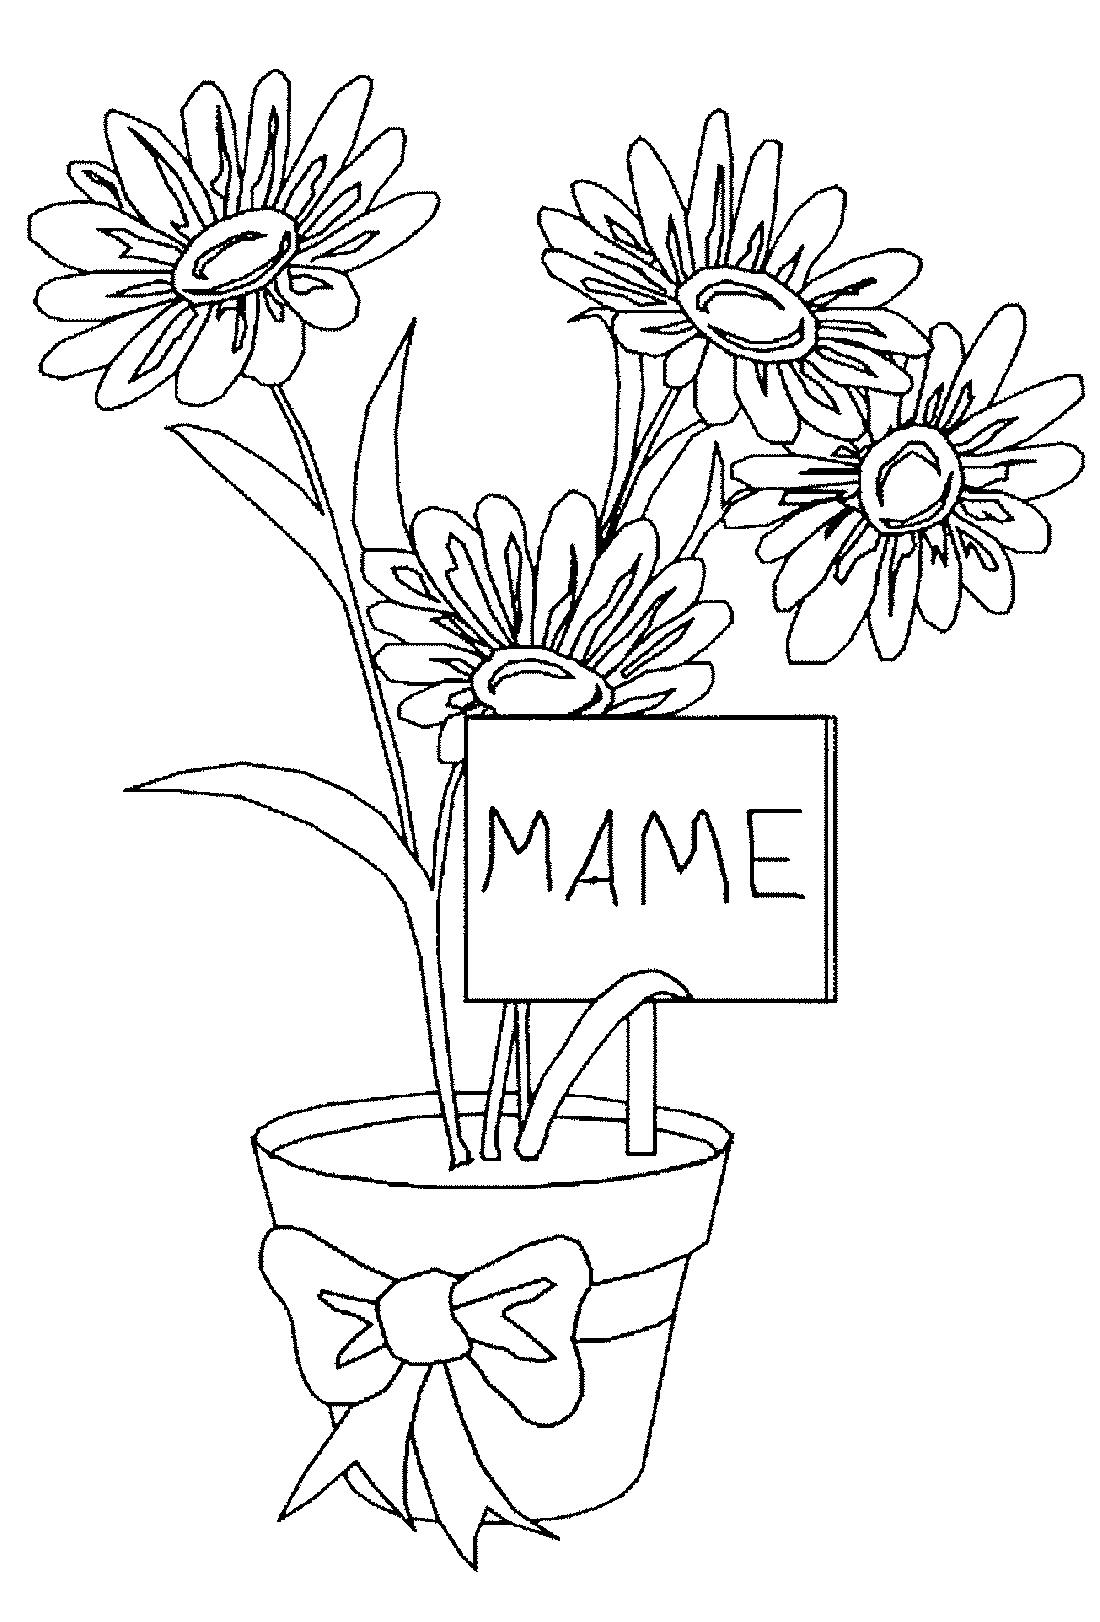 Цветы для мамы - раскраска №11766 | Printonic.ru